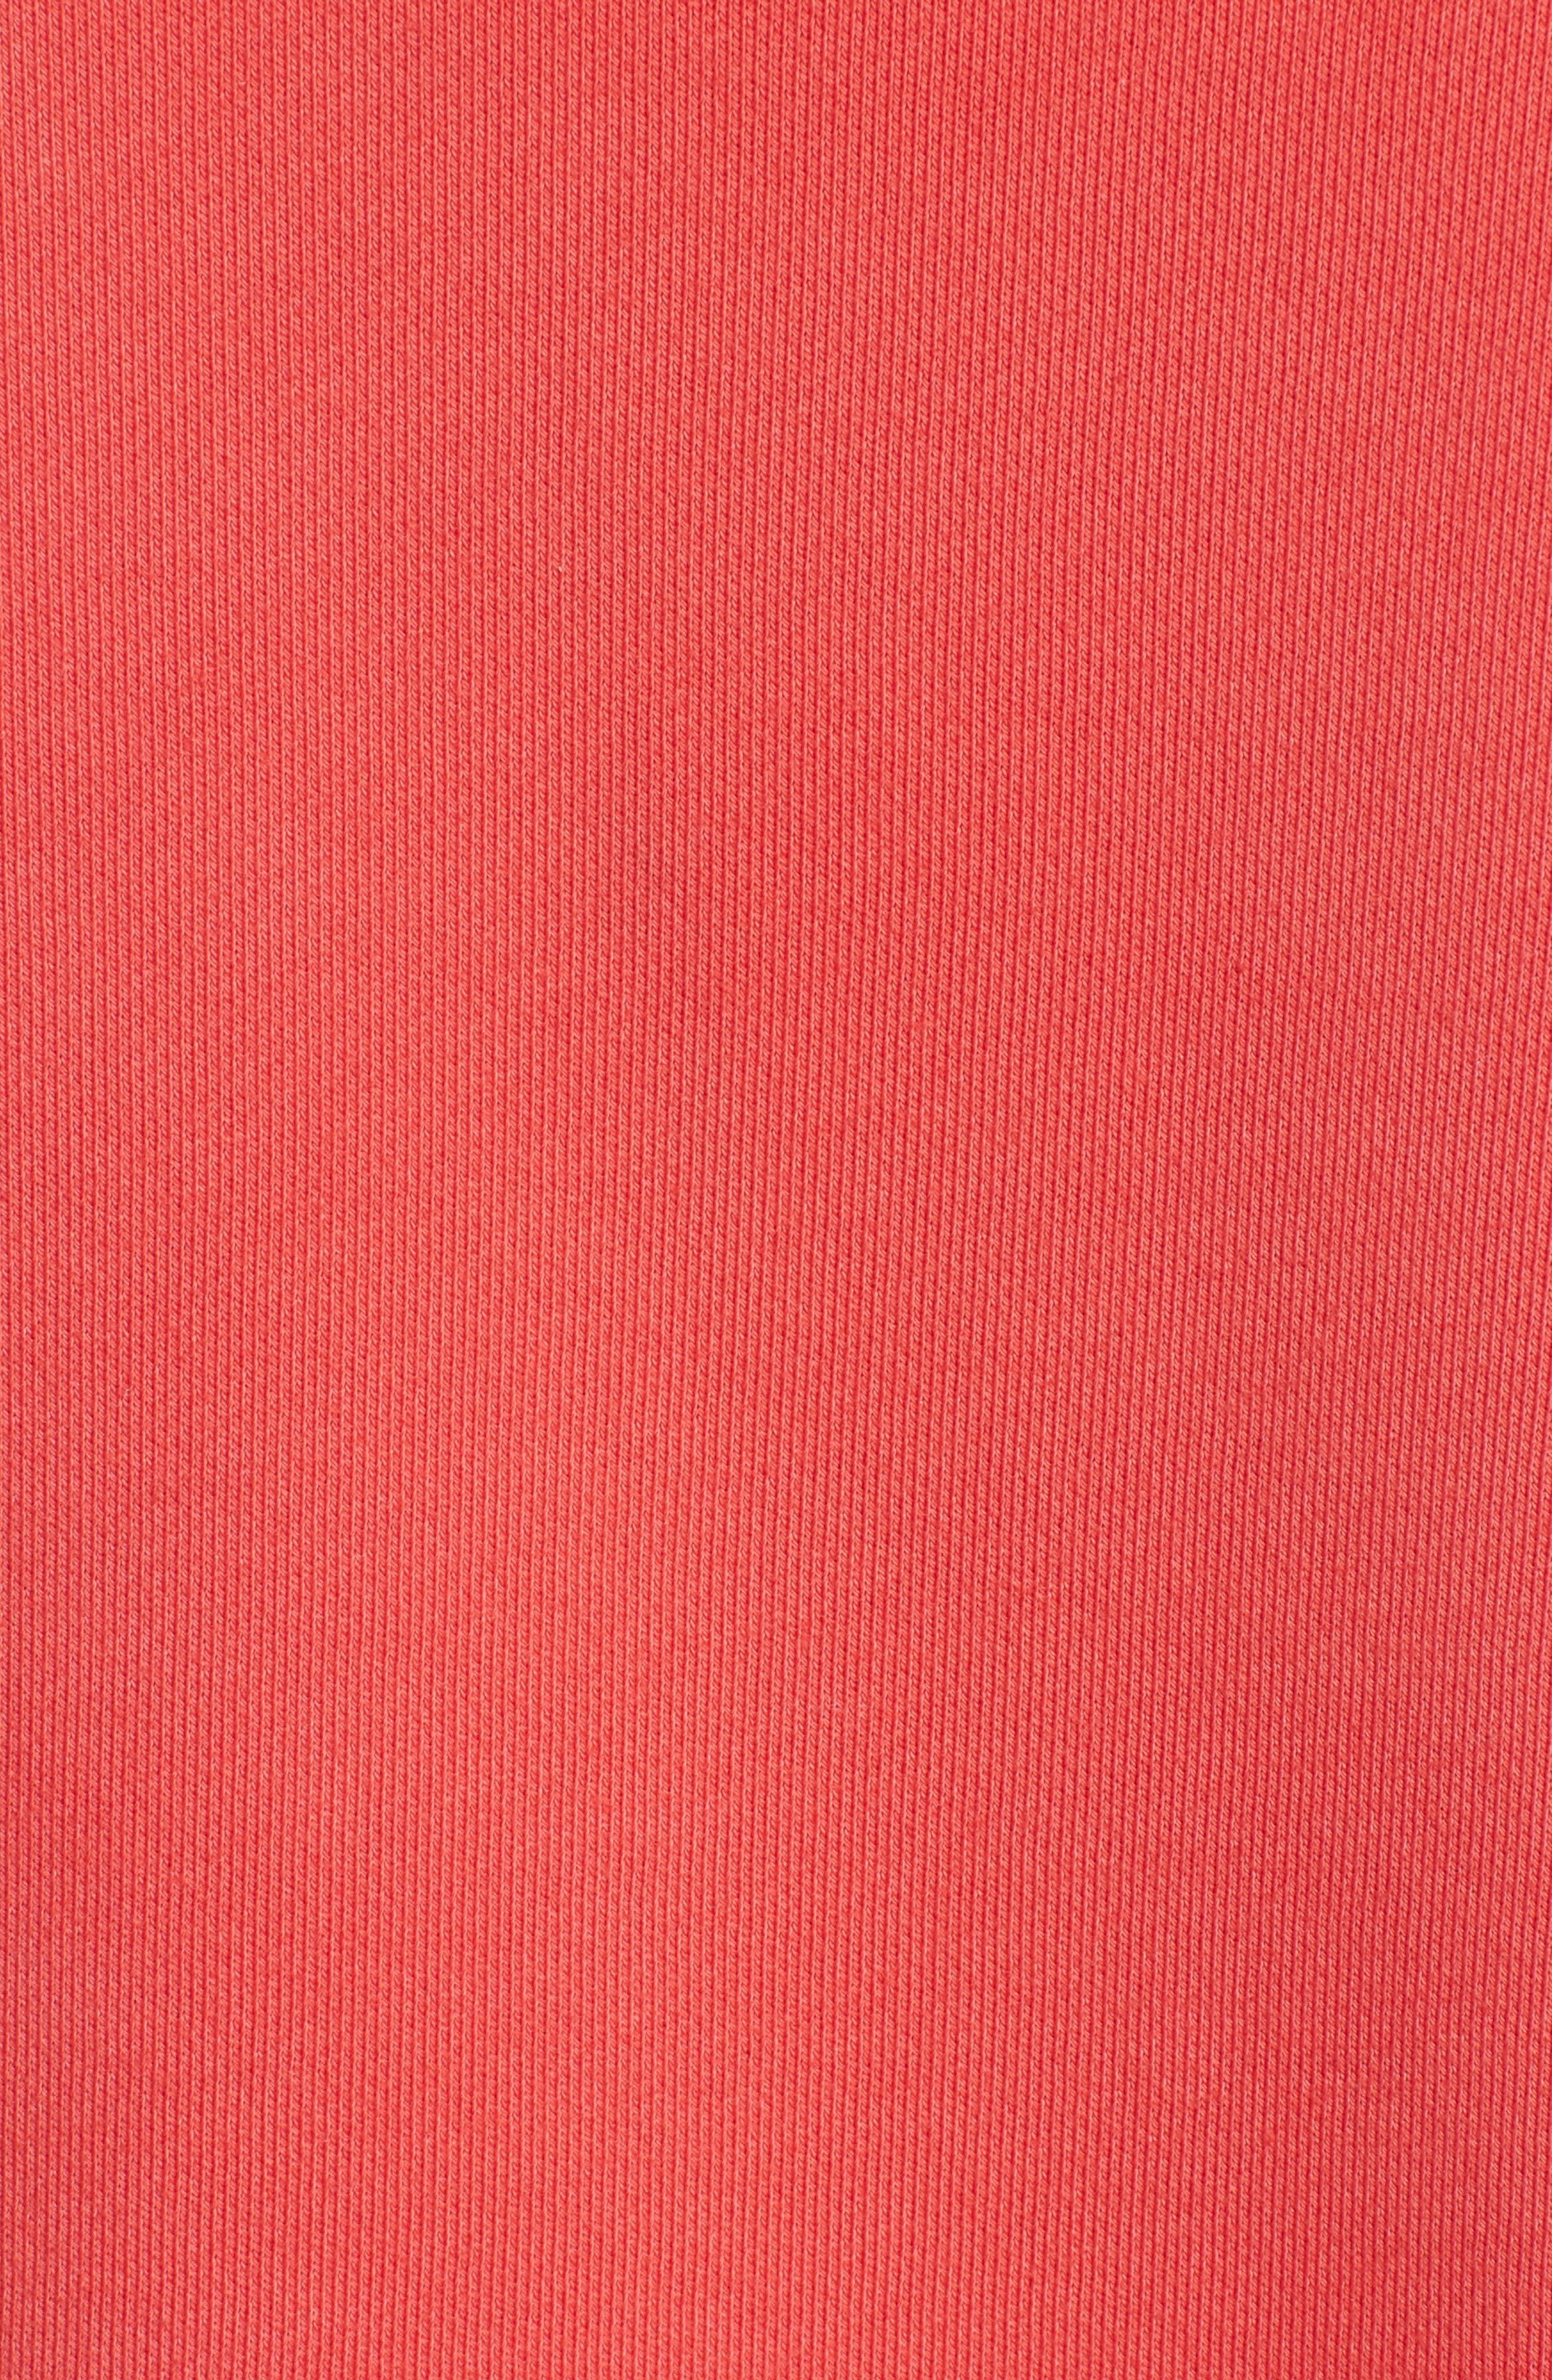 Mickey Shrunken Sweatshirt,                             Alternate thumbnail 3, color,                             Red